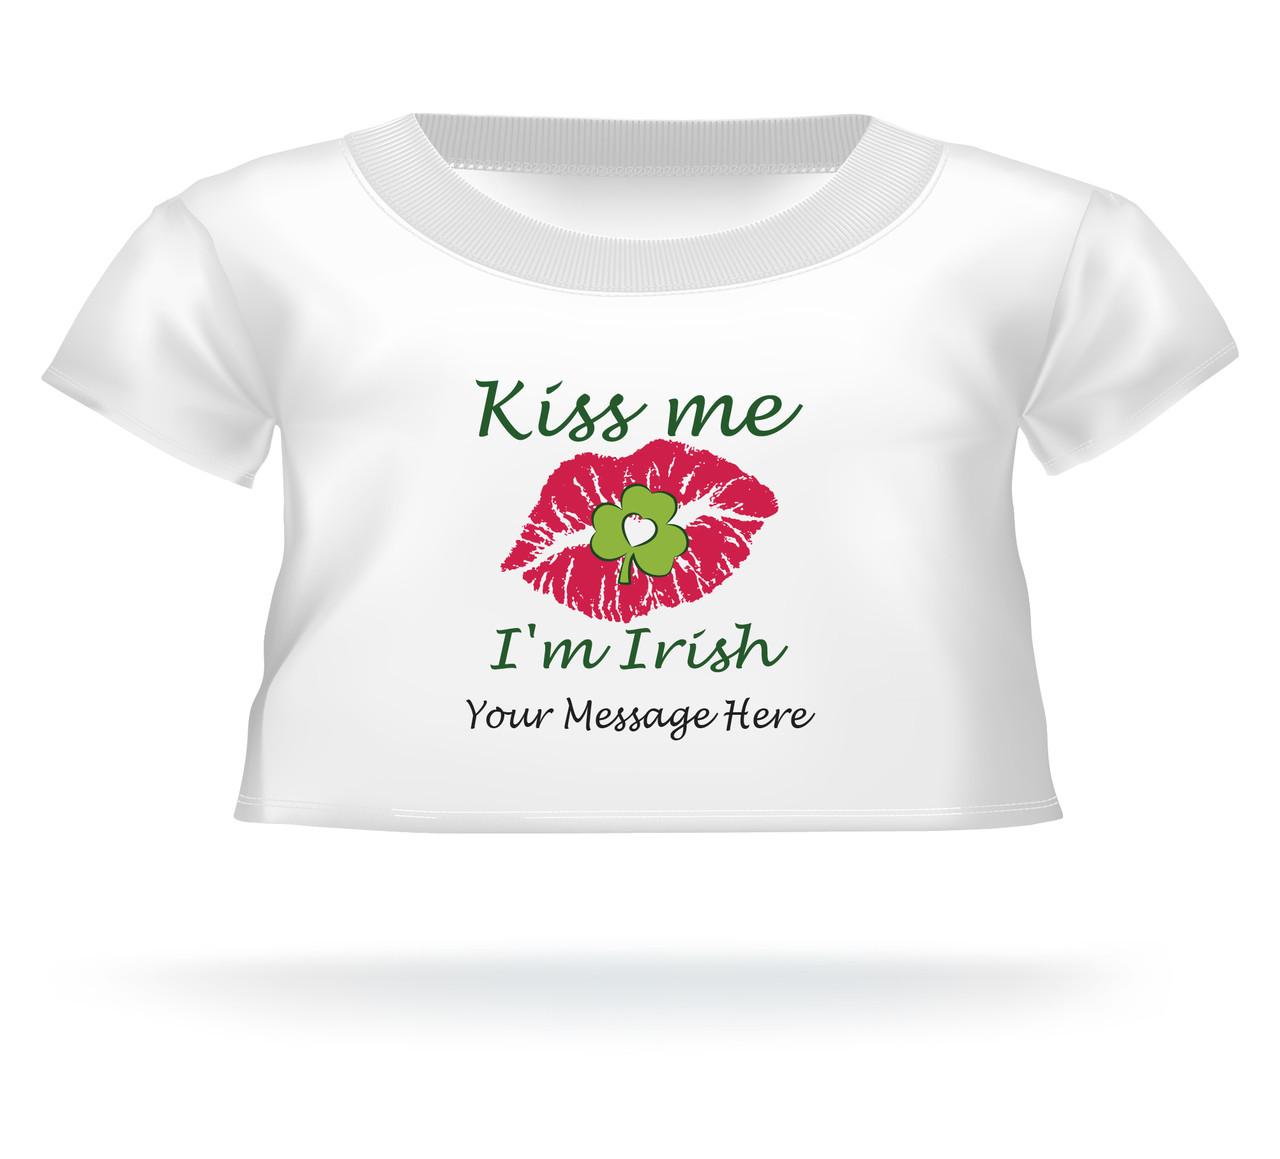 St. Patrick's Day Kiss Me I'm Irish lips sealed w/clover Giant Teddy Bear Personalized Shirt